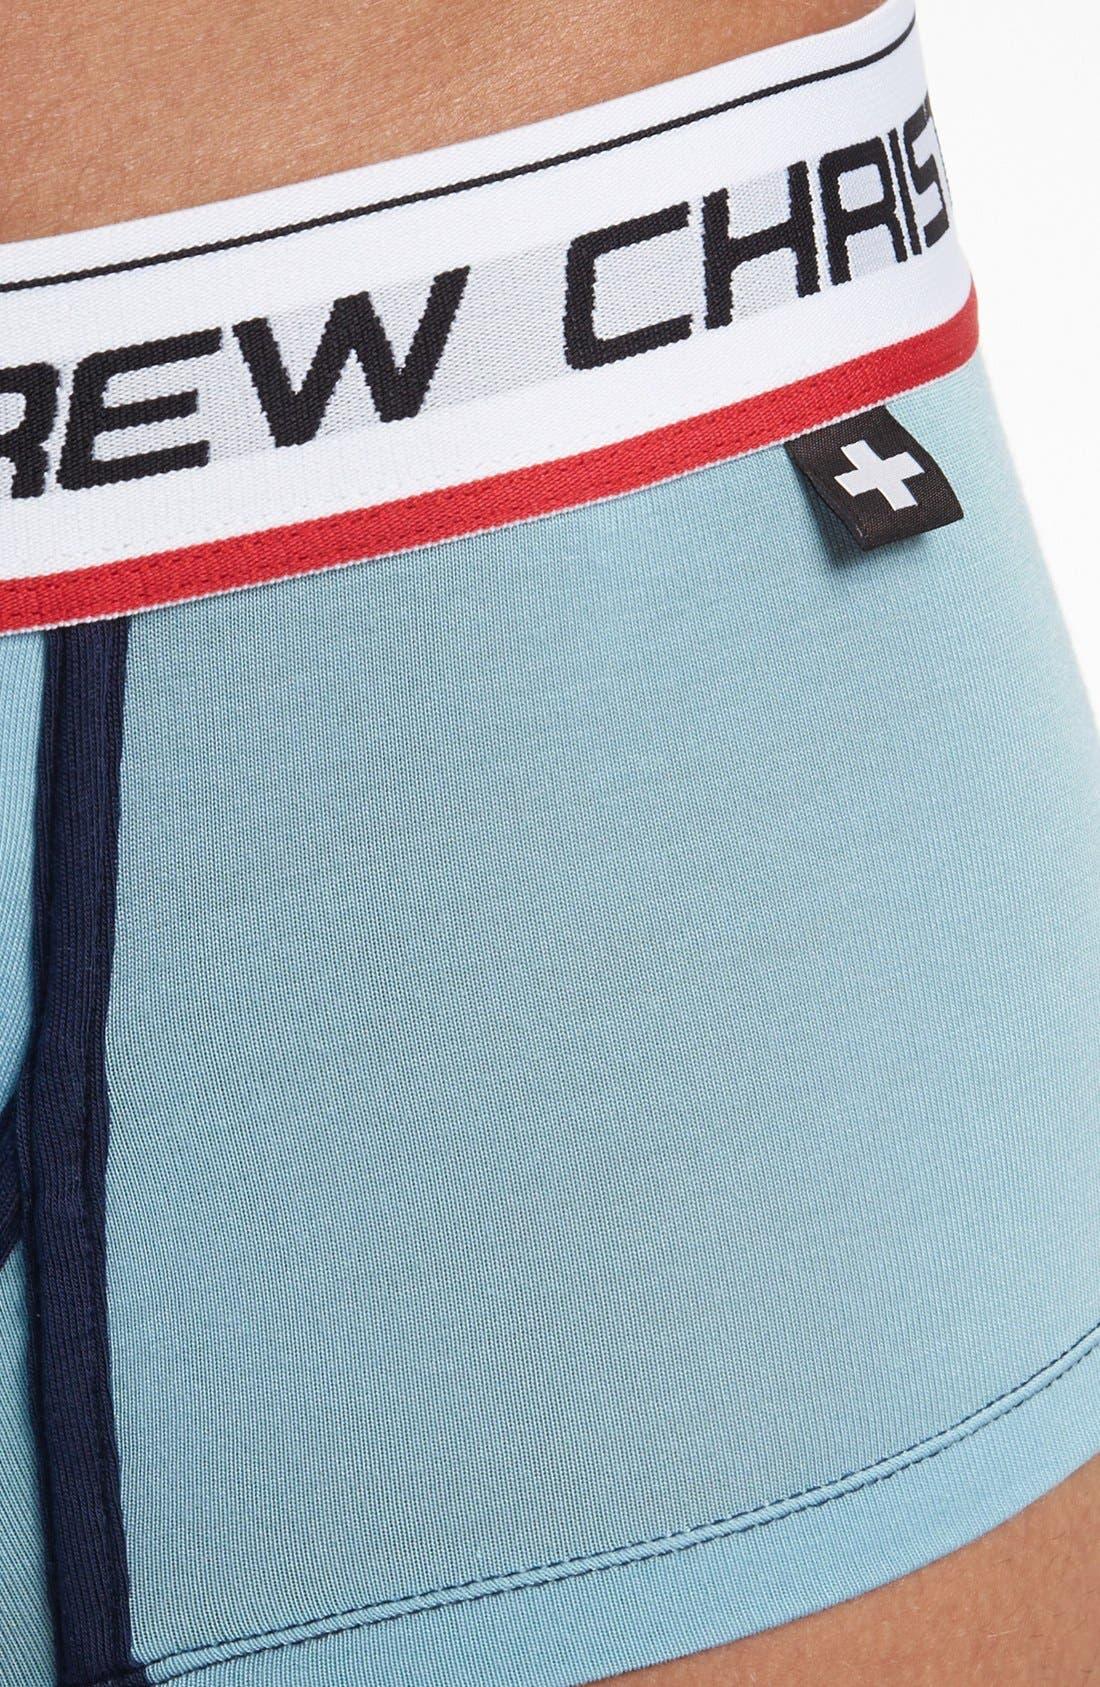 Alternate Image 3  - Andrew Christian 'Cool Flex' Boxer Briefs